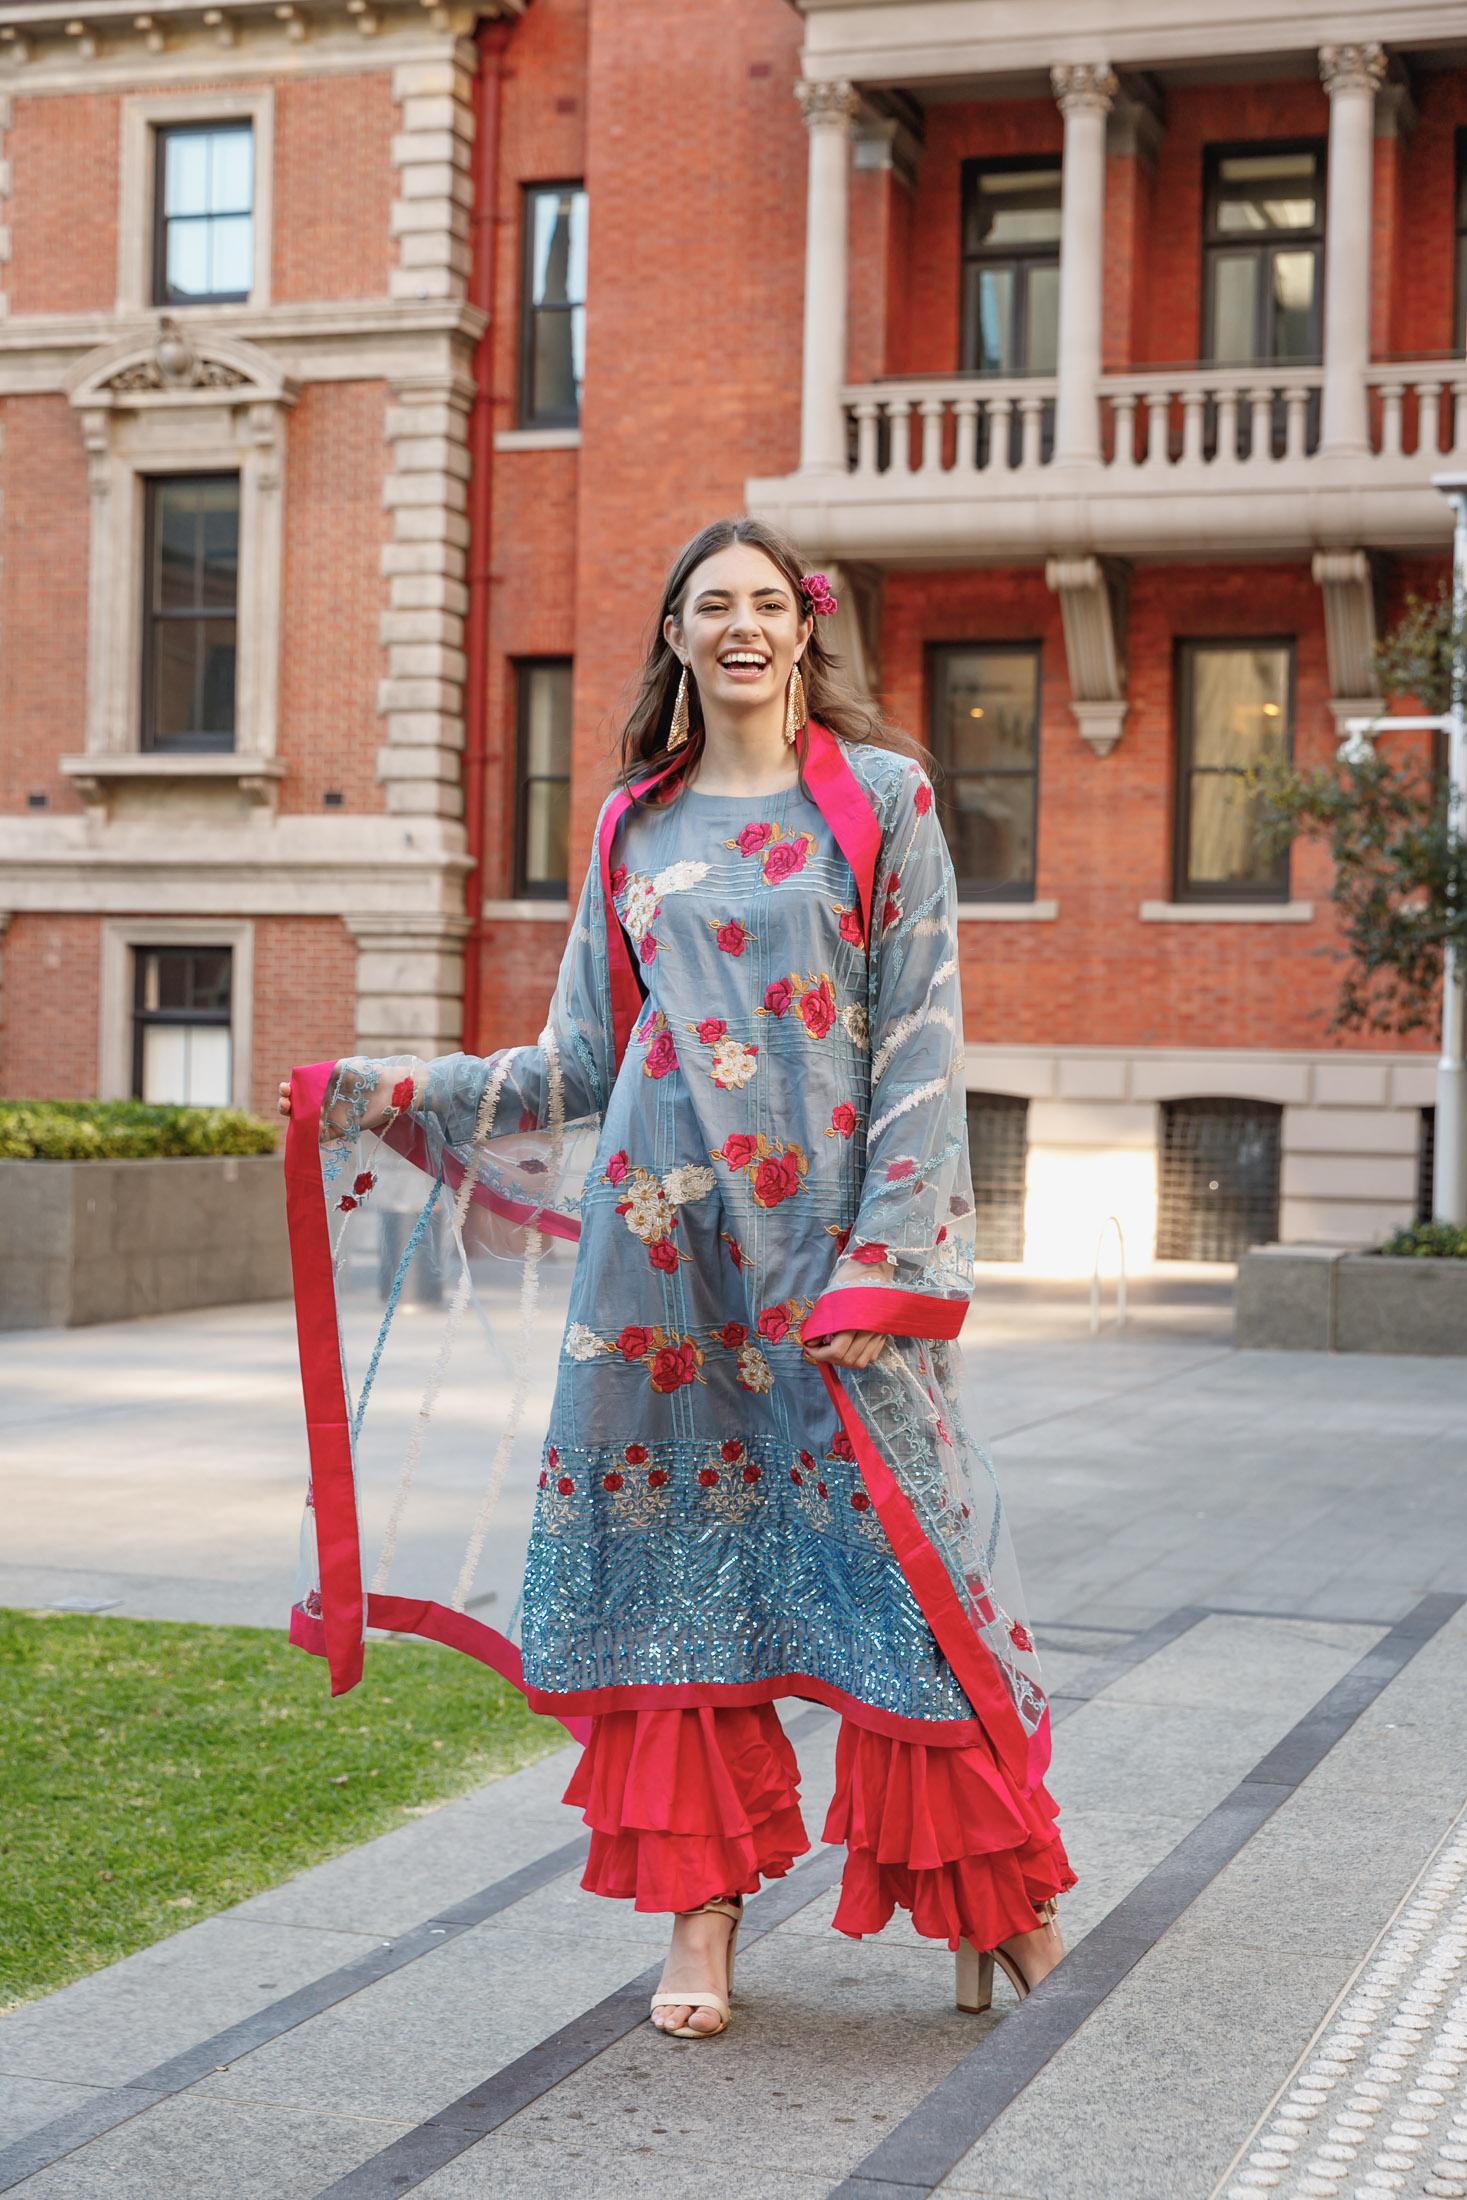 Ammon_Creative-Fashion_Photography-Vogue_Sultana_Bangladesh-Old_Treasury-Perth-012-1119.jpg